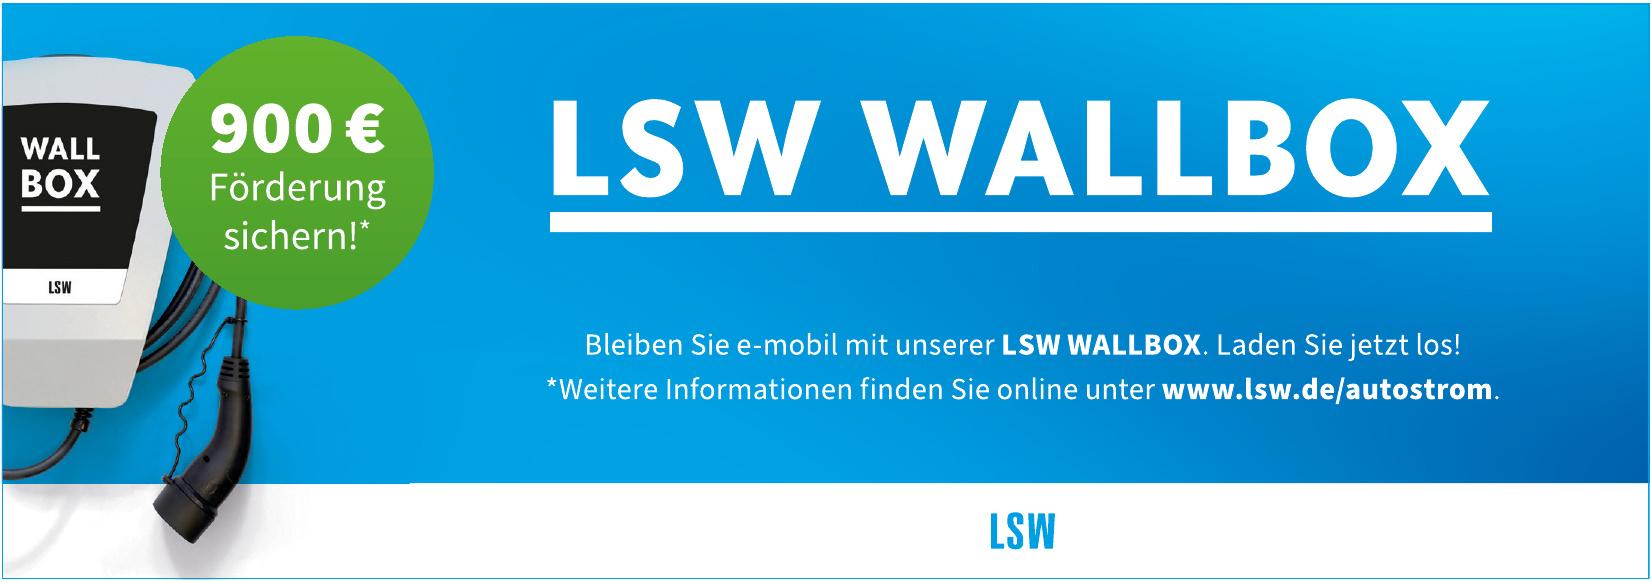 LSW Wallbox